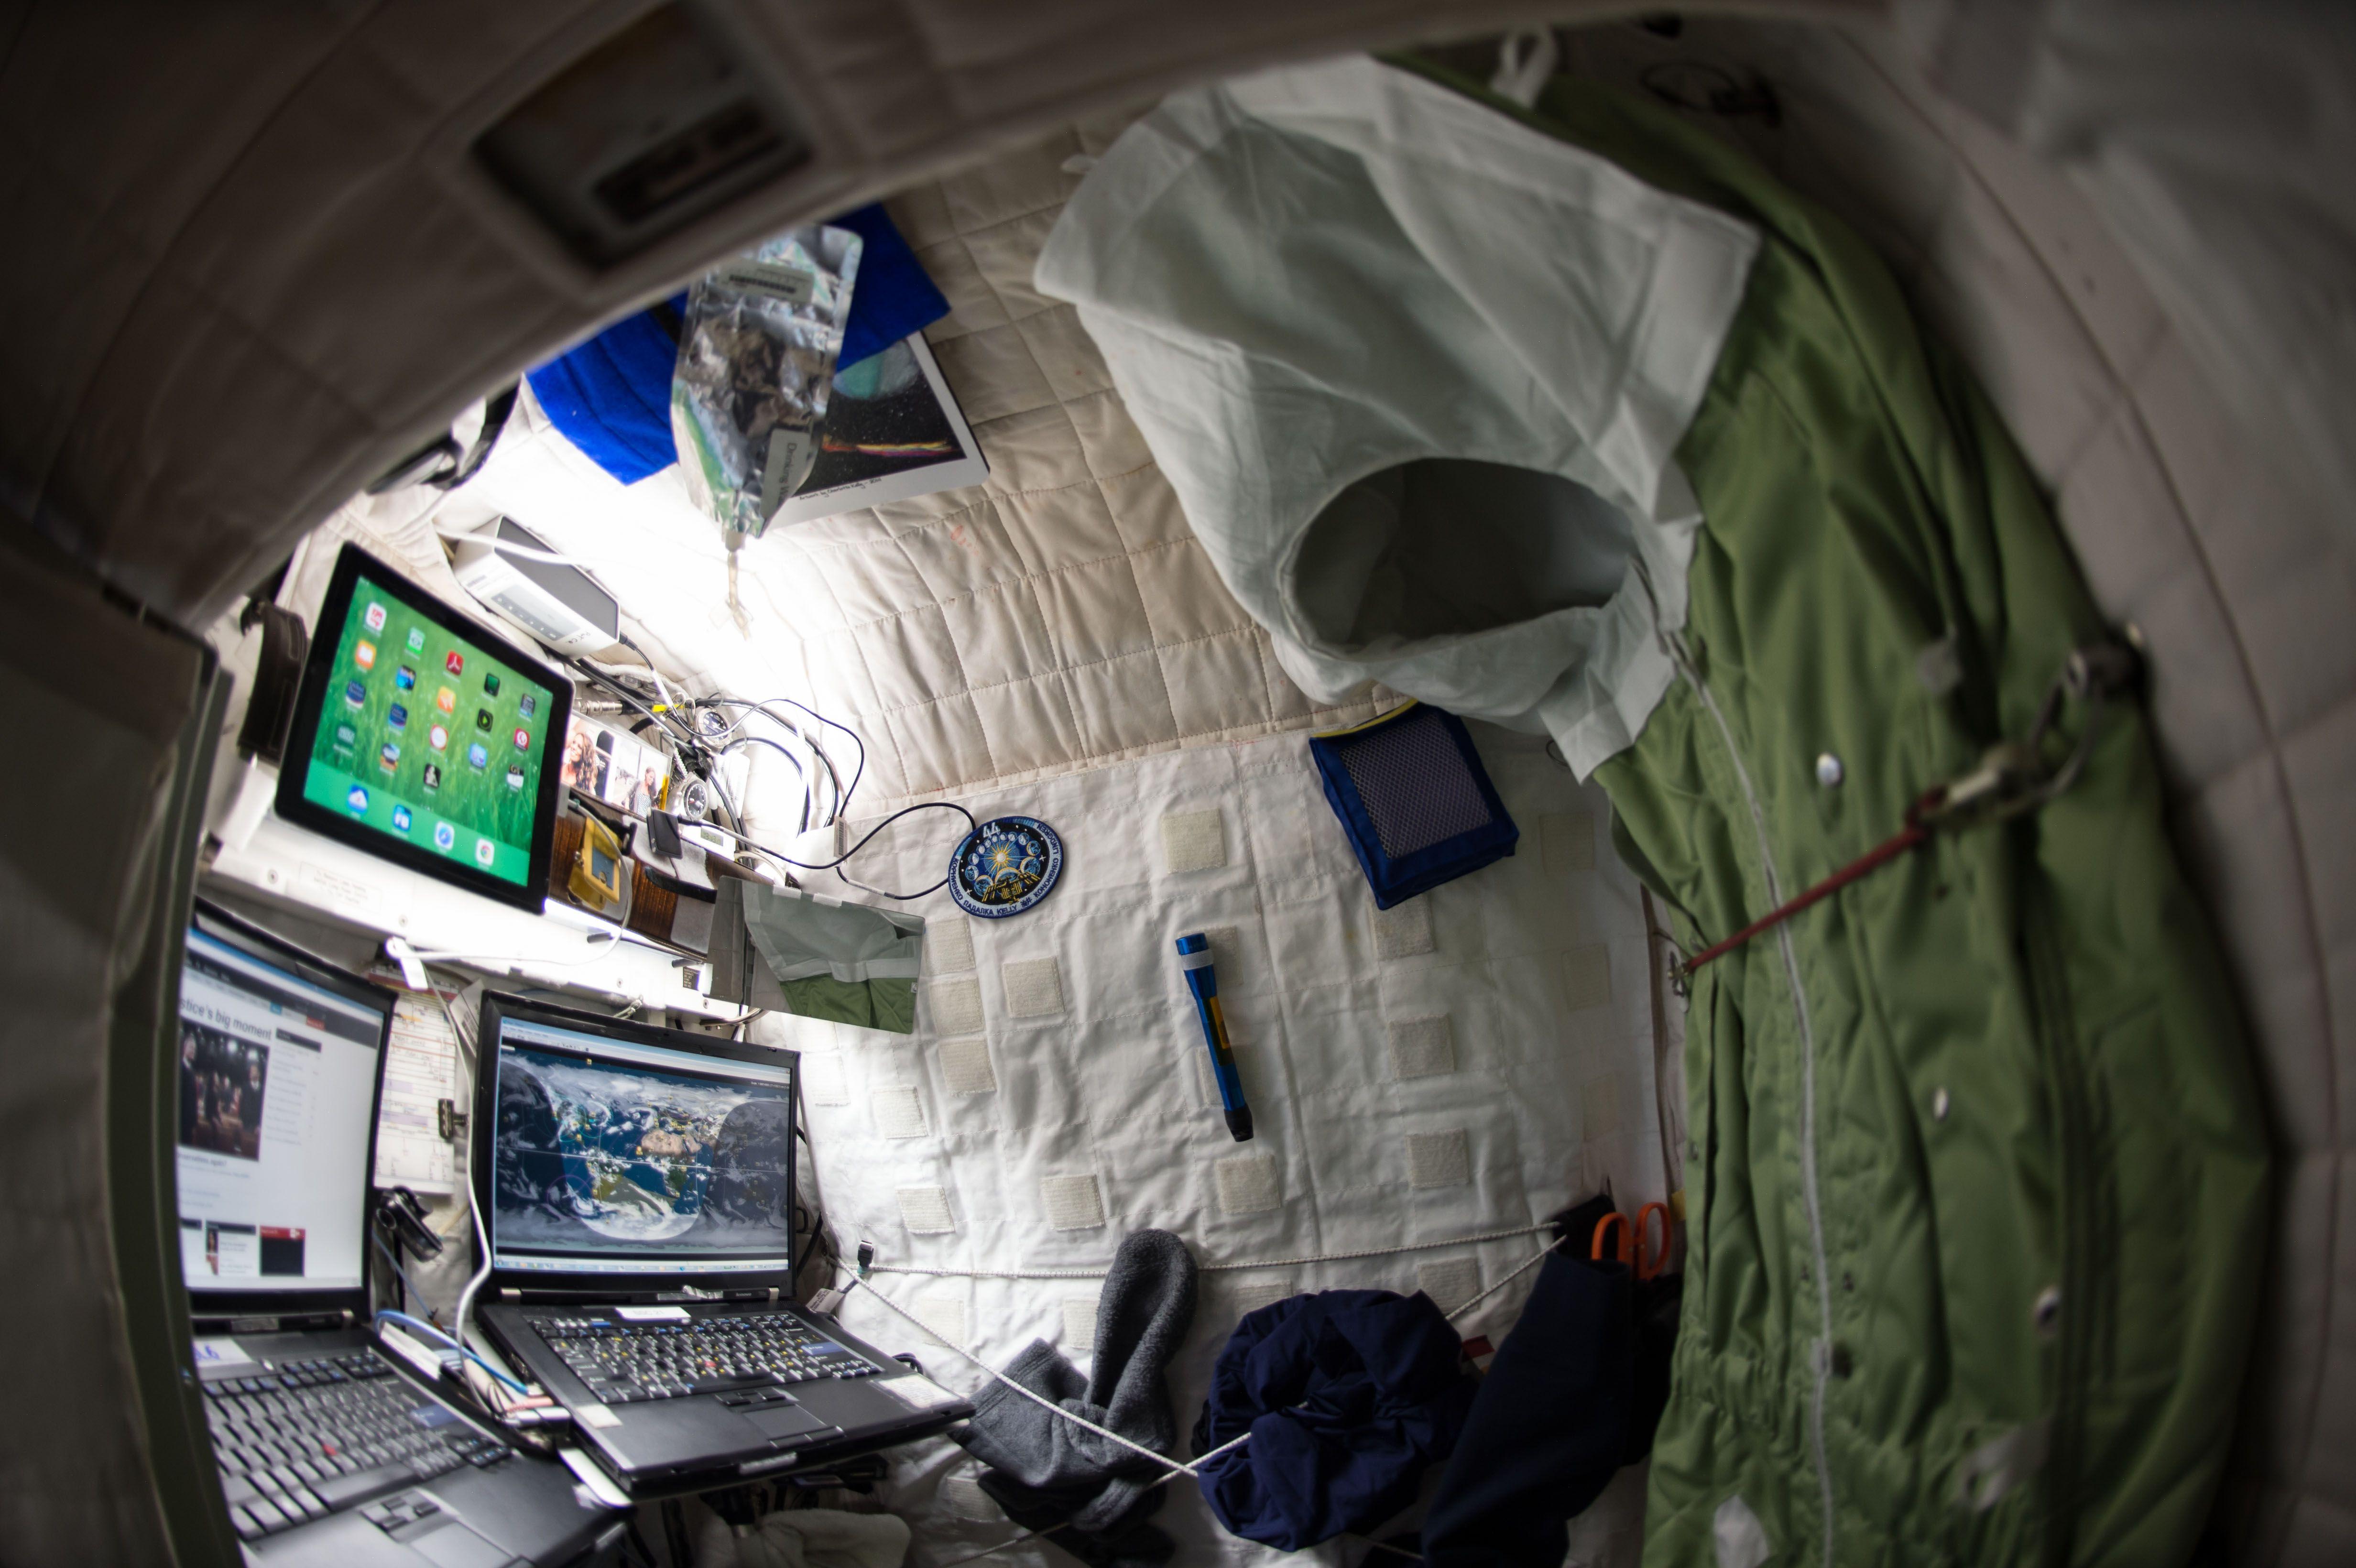 Scott Kelly personal quarters on ISS.